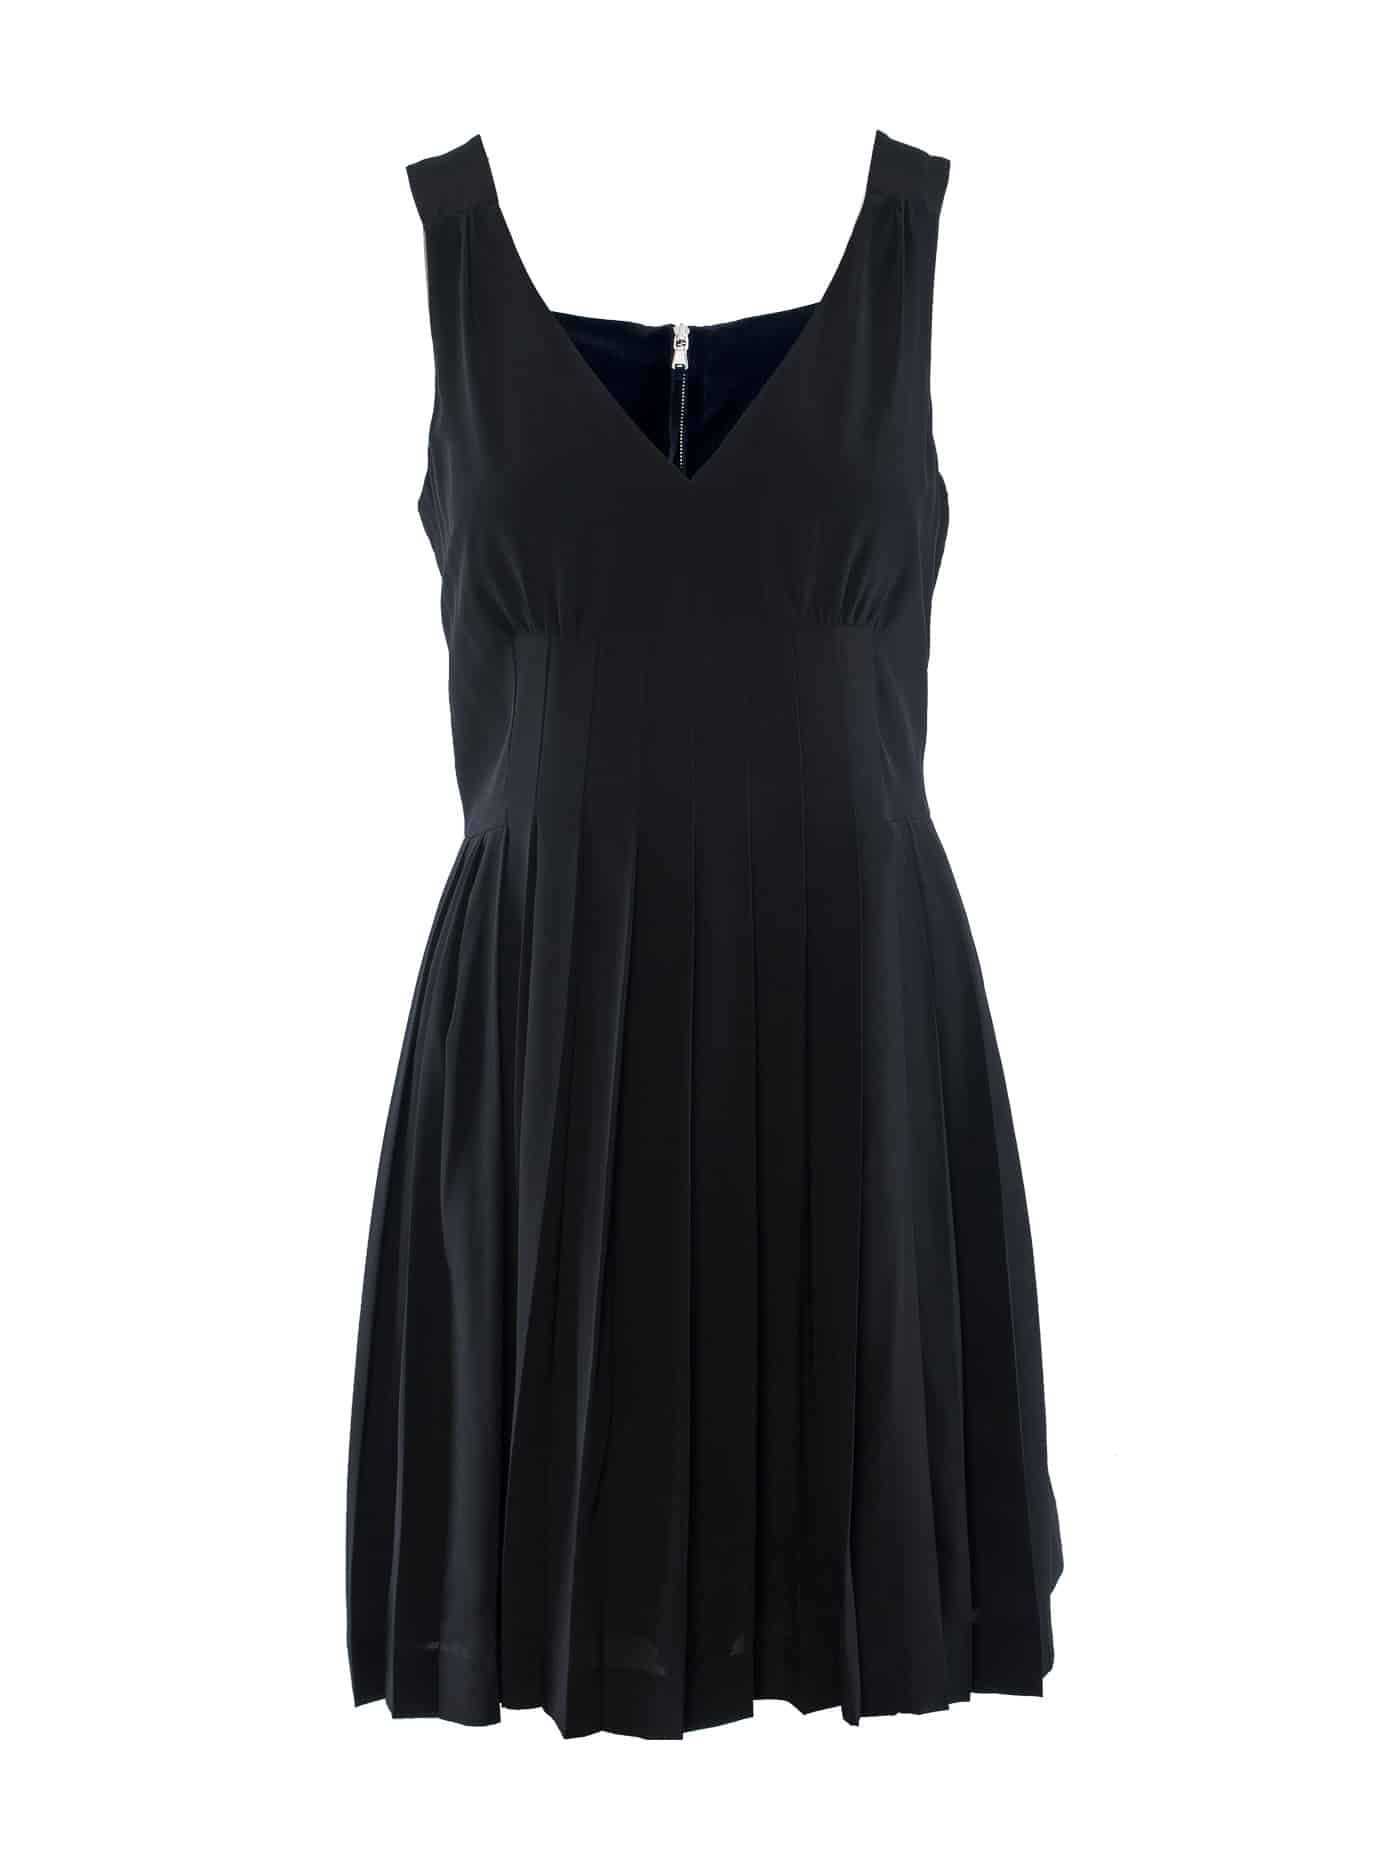 Black Marc Jacobs sleeveless cocktail dress - fEROSh